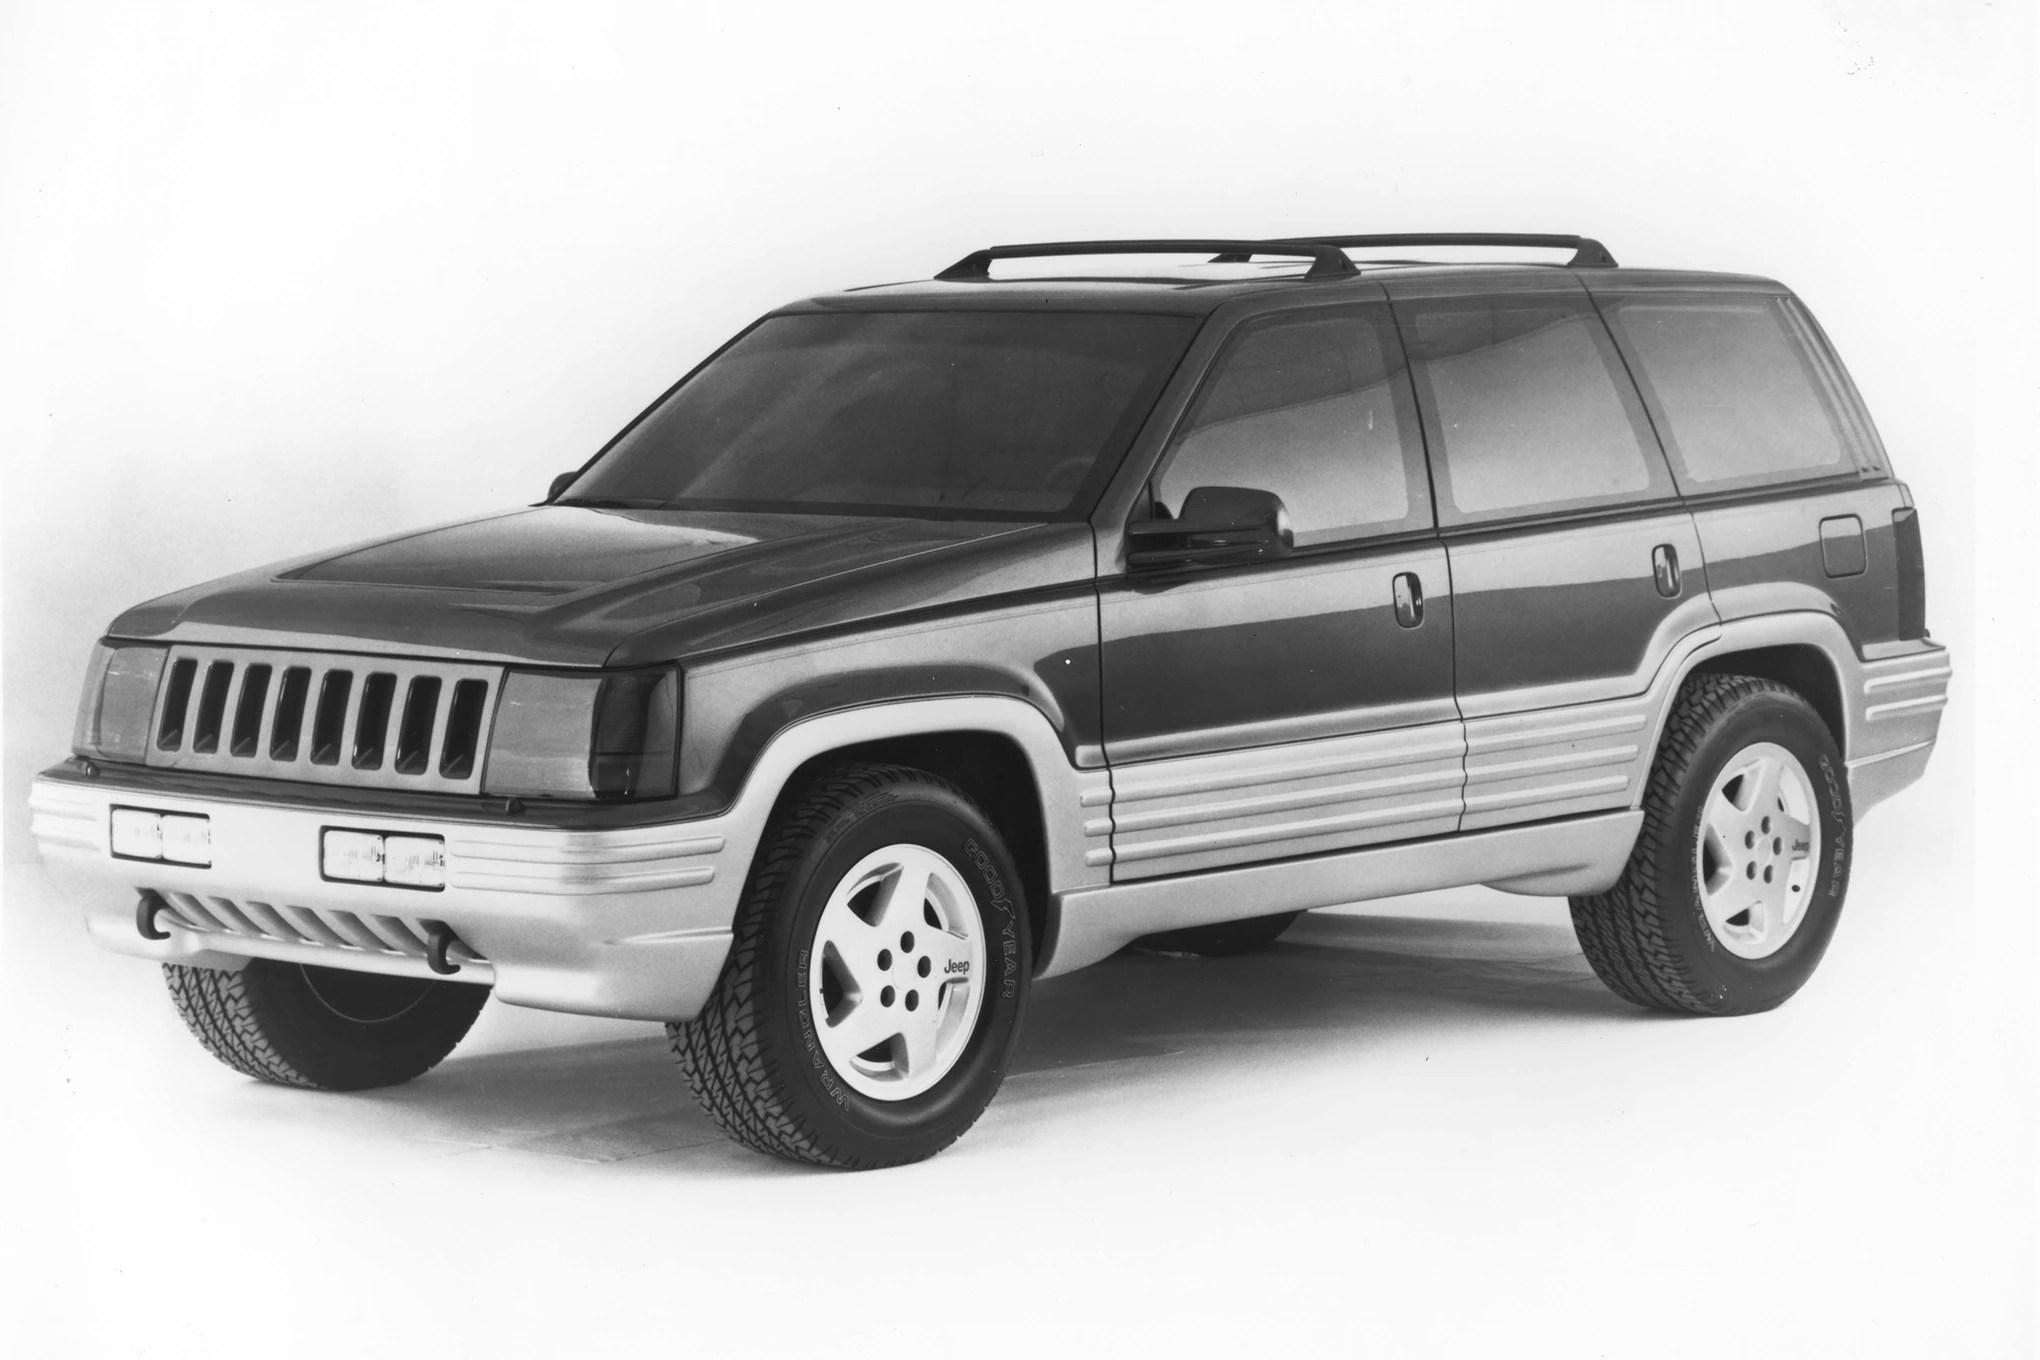 hight resolution of  011 1989 jeep concept 1 012 1993 jeep grand cherokee laredo